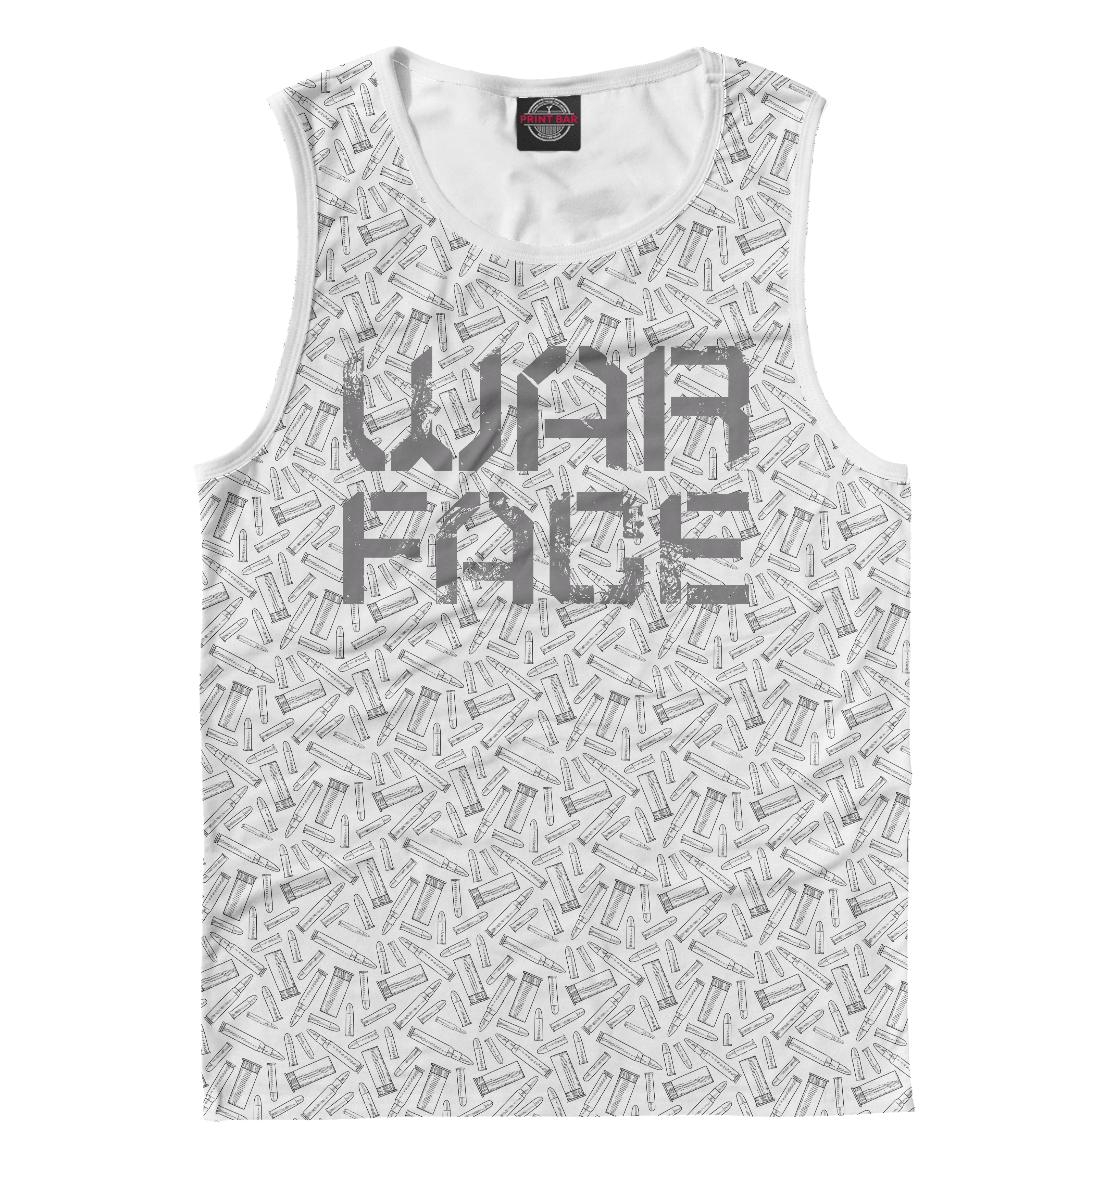 Купить Warface, Printbar, Майки, RPG-126789-may-2